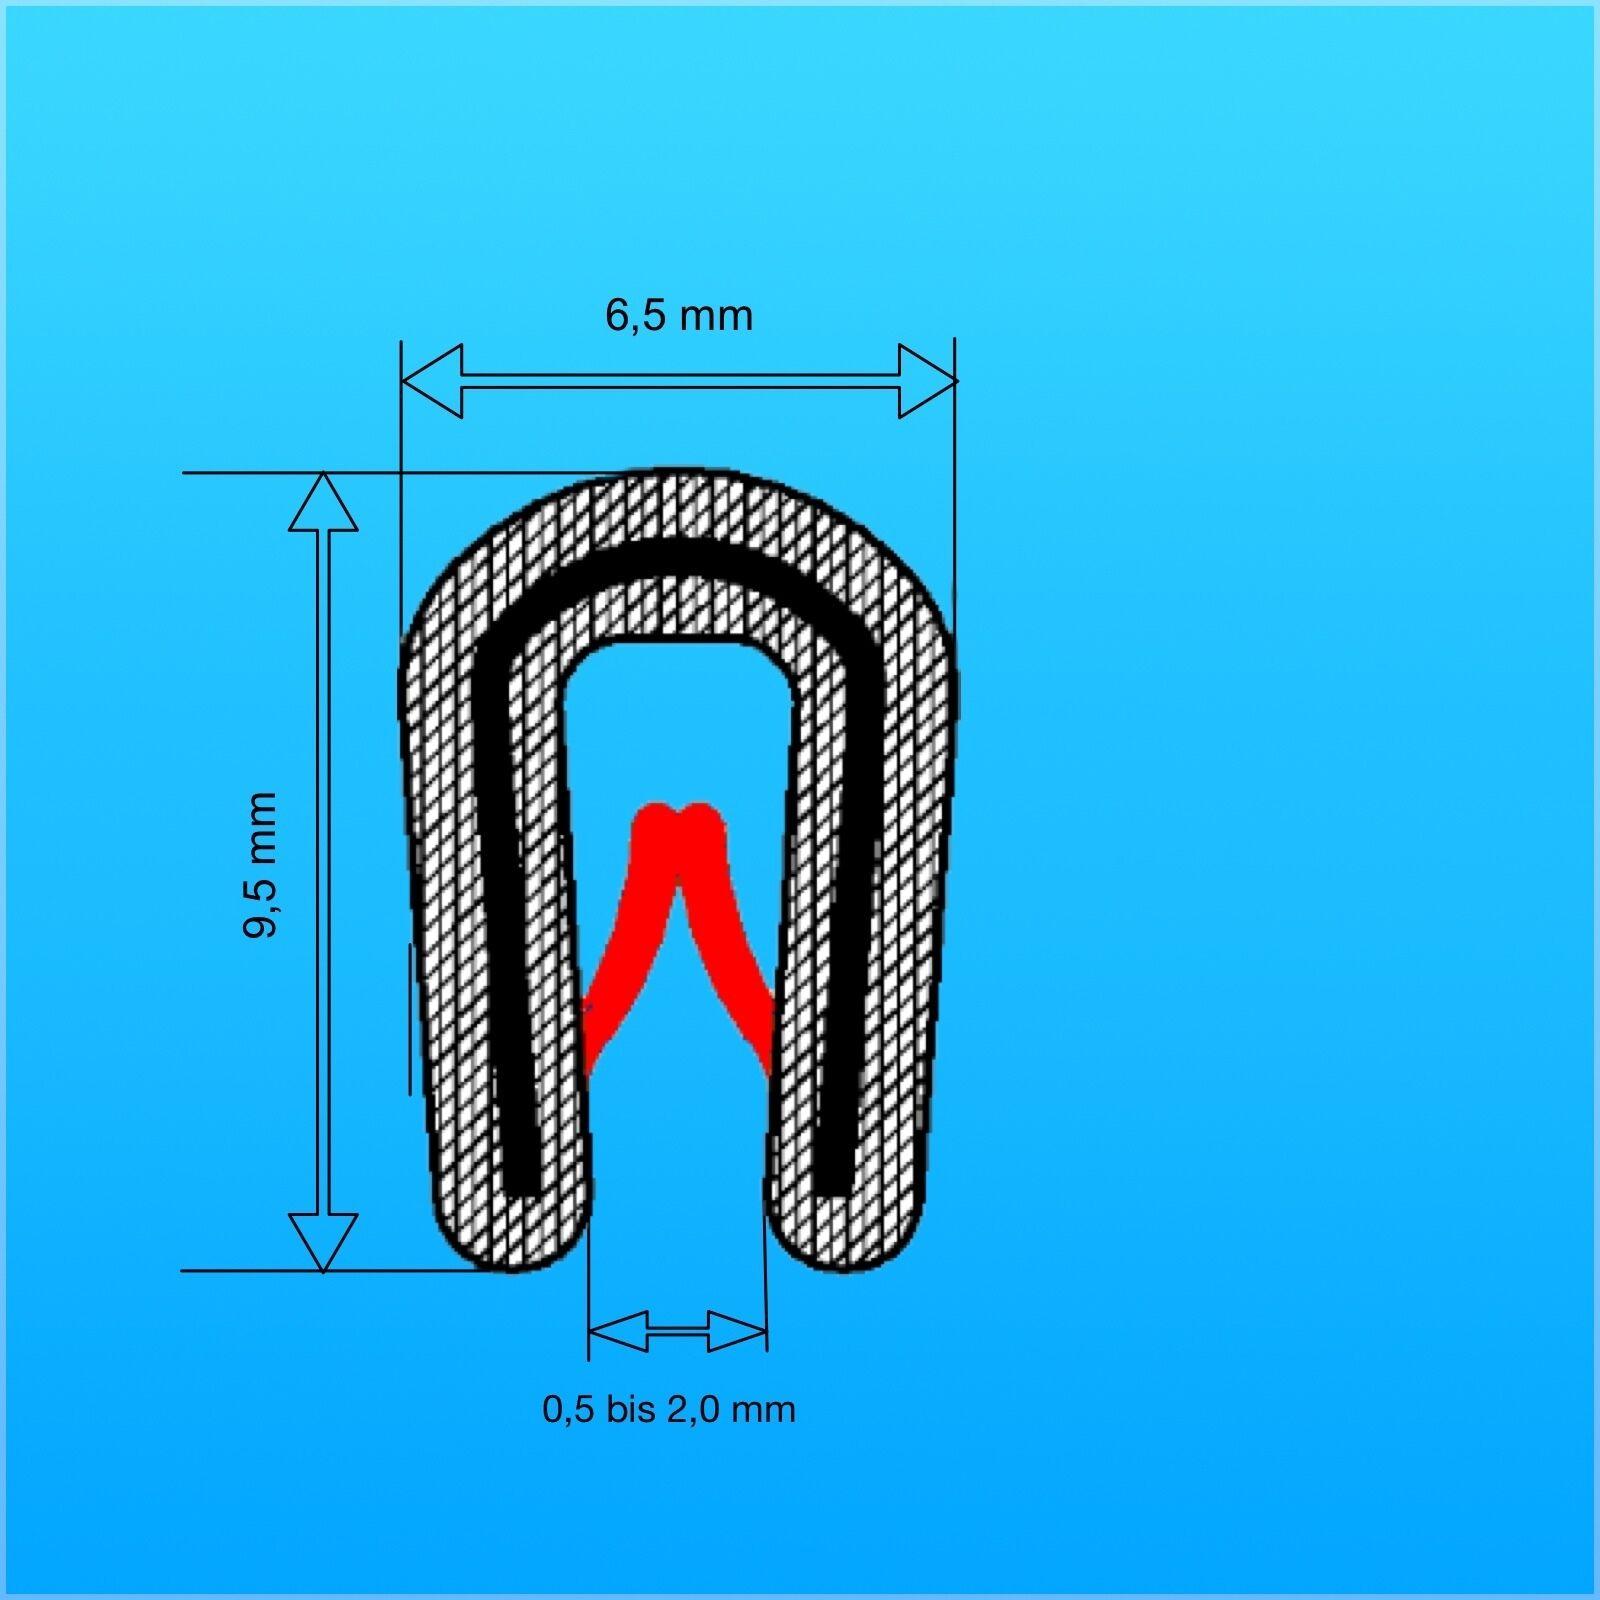 100 m Kantenschutzprofil flexibel schwarz Klemmbereich 1,0-2,0 mm